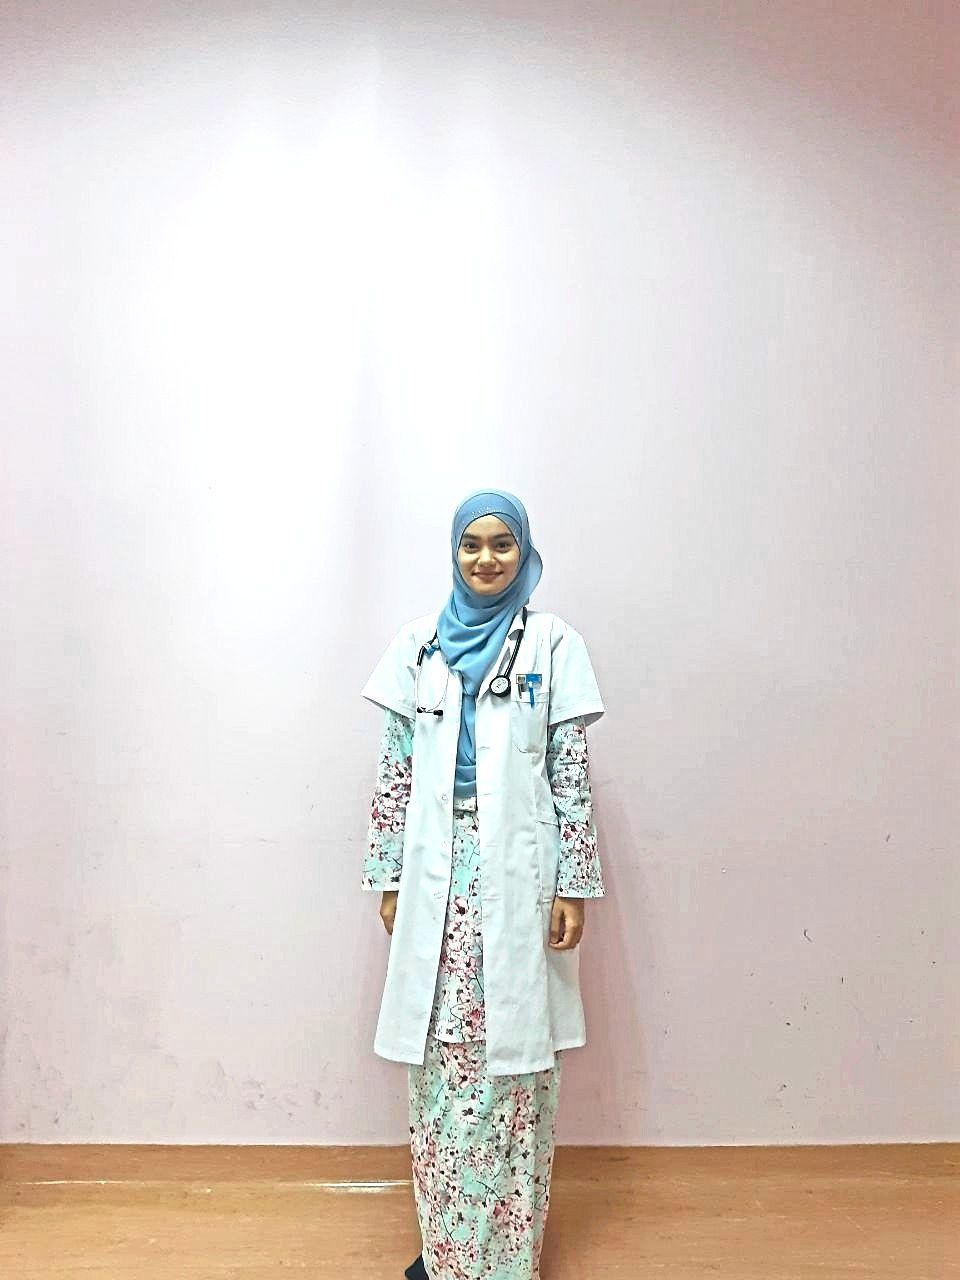 Rawiah has graduated with a medical degree from Universiti Sains Malaysia in Kubang Kerian.